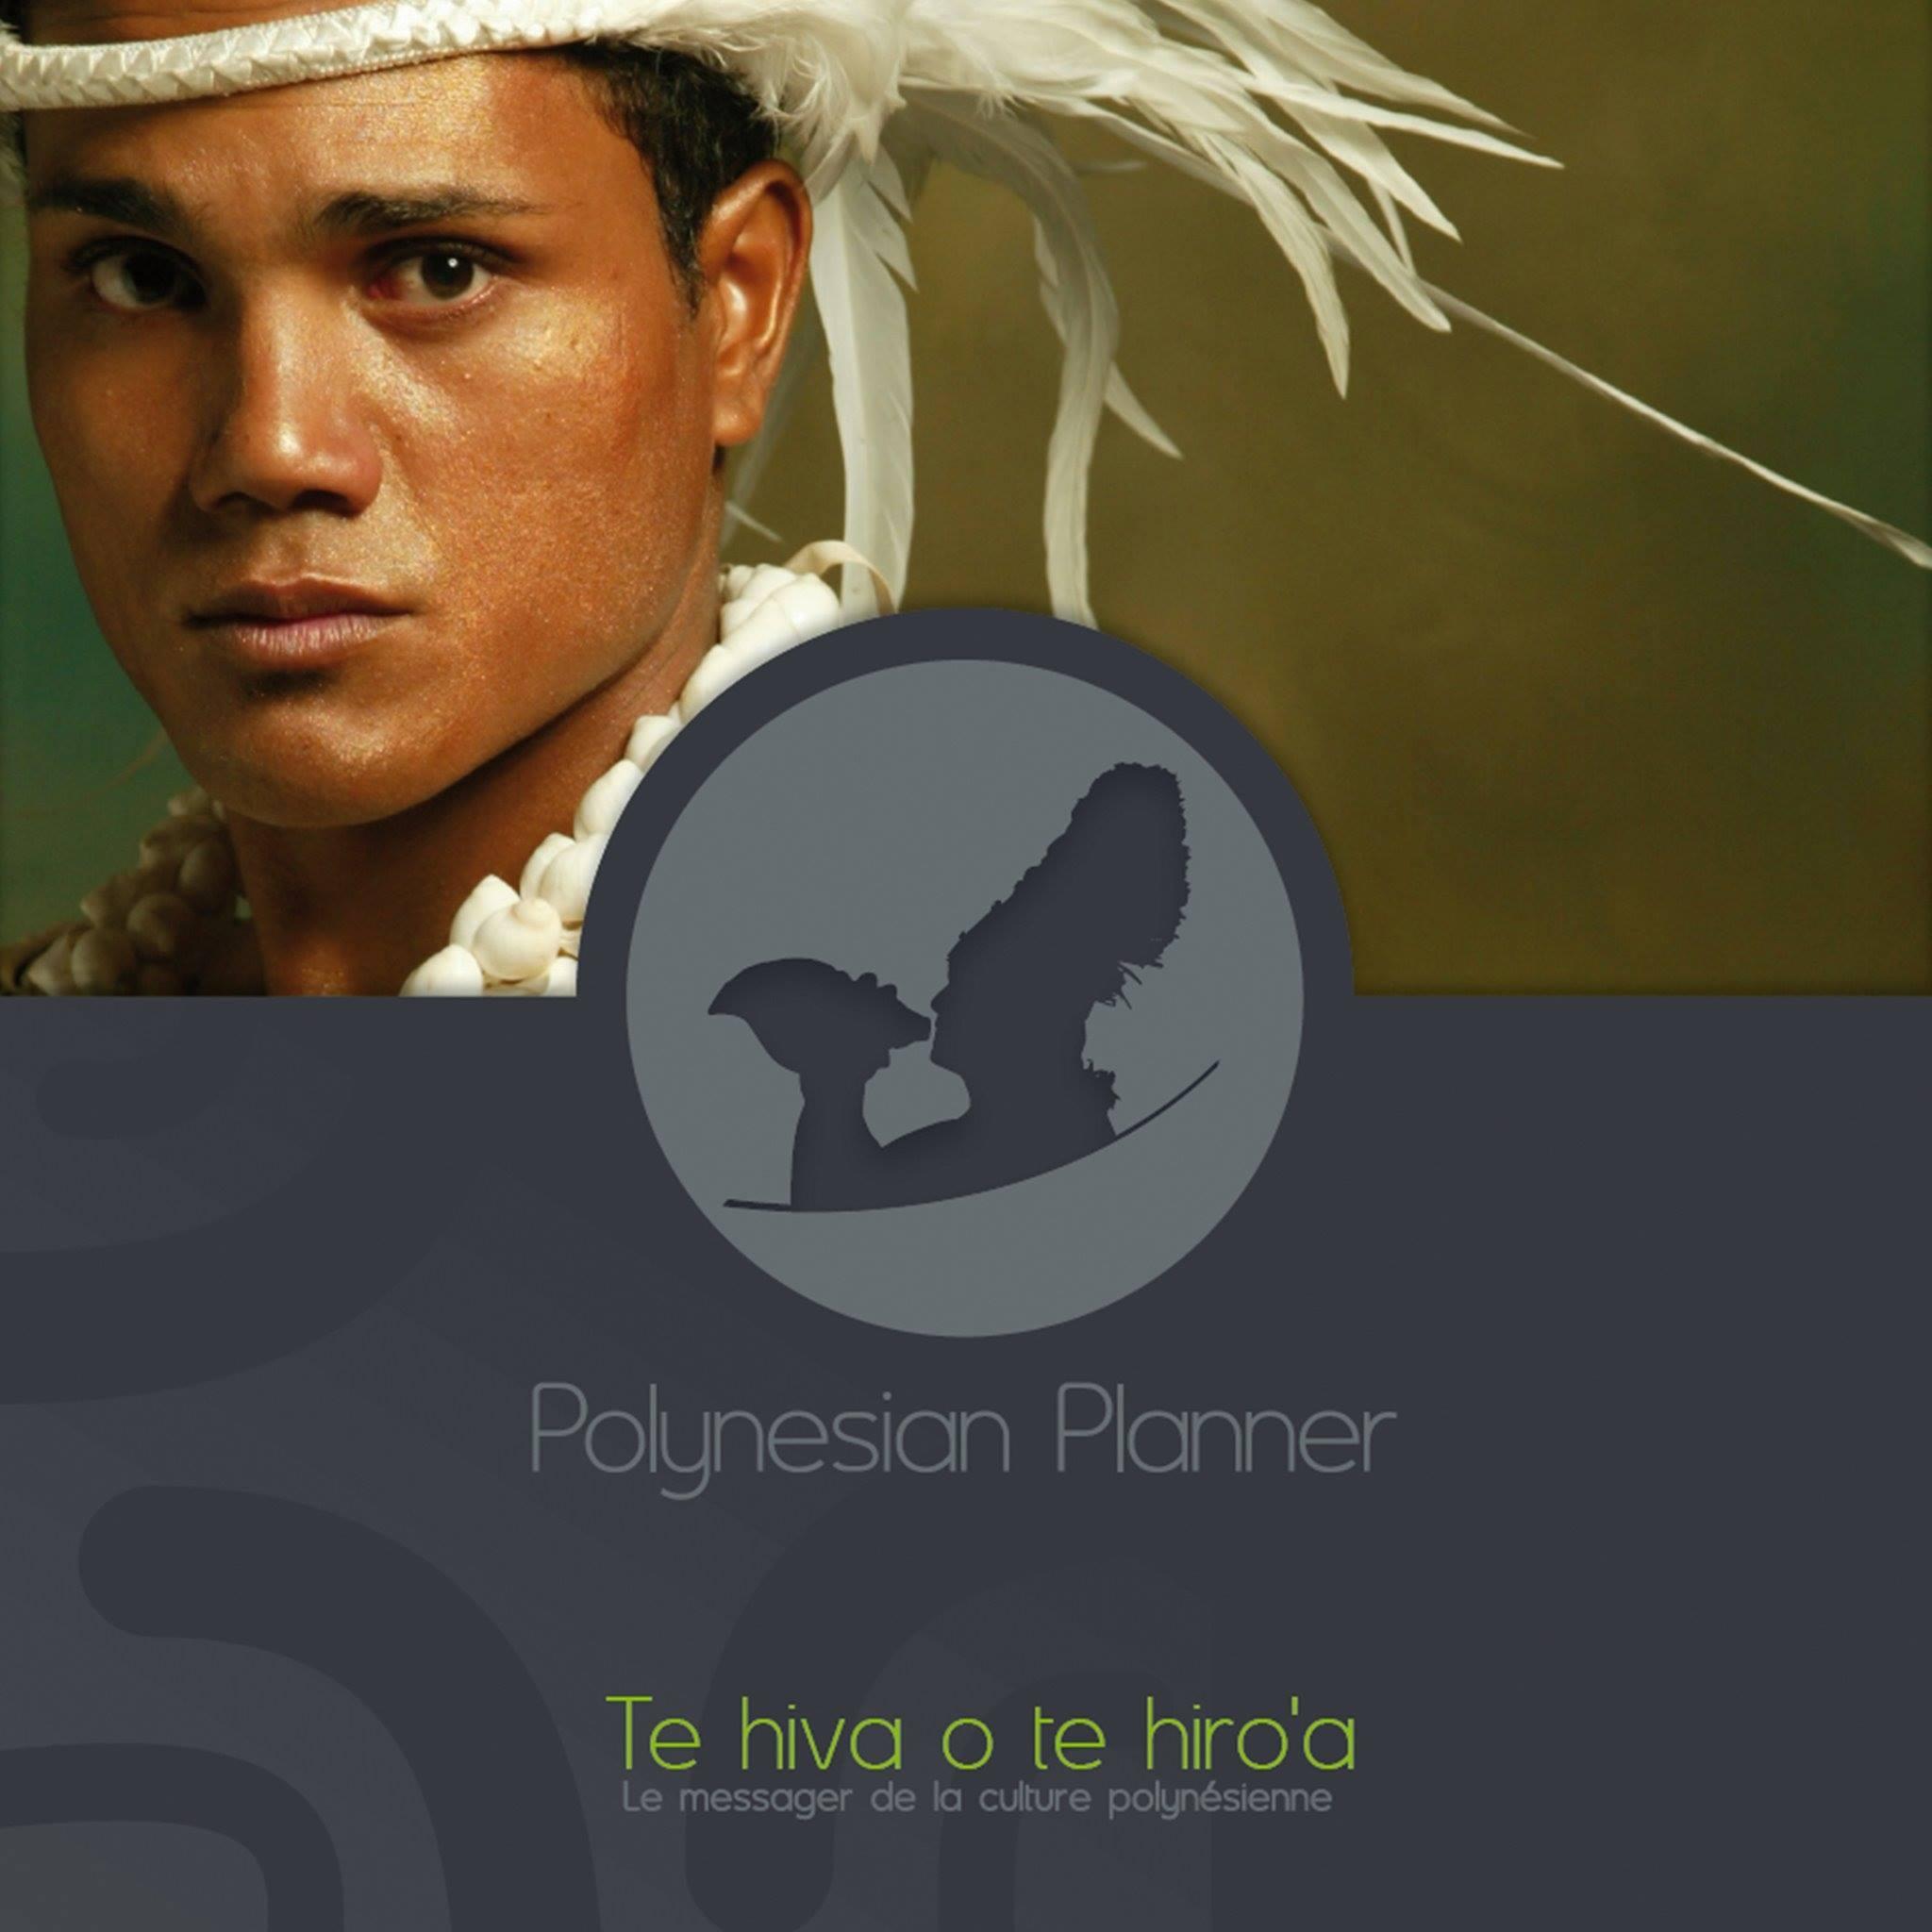 https://tahititourisme.de/wp-content/uploads/2017/08/polynesianplannerphotodeprofil.jpg